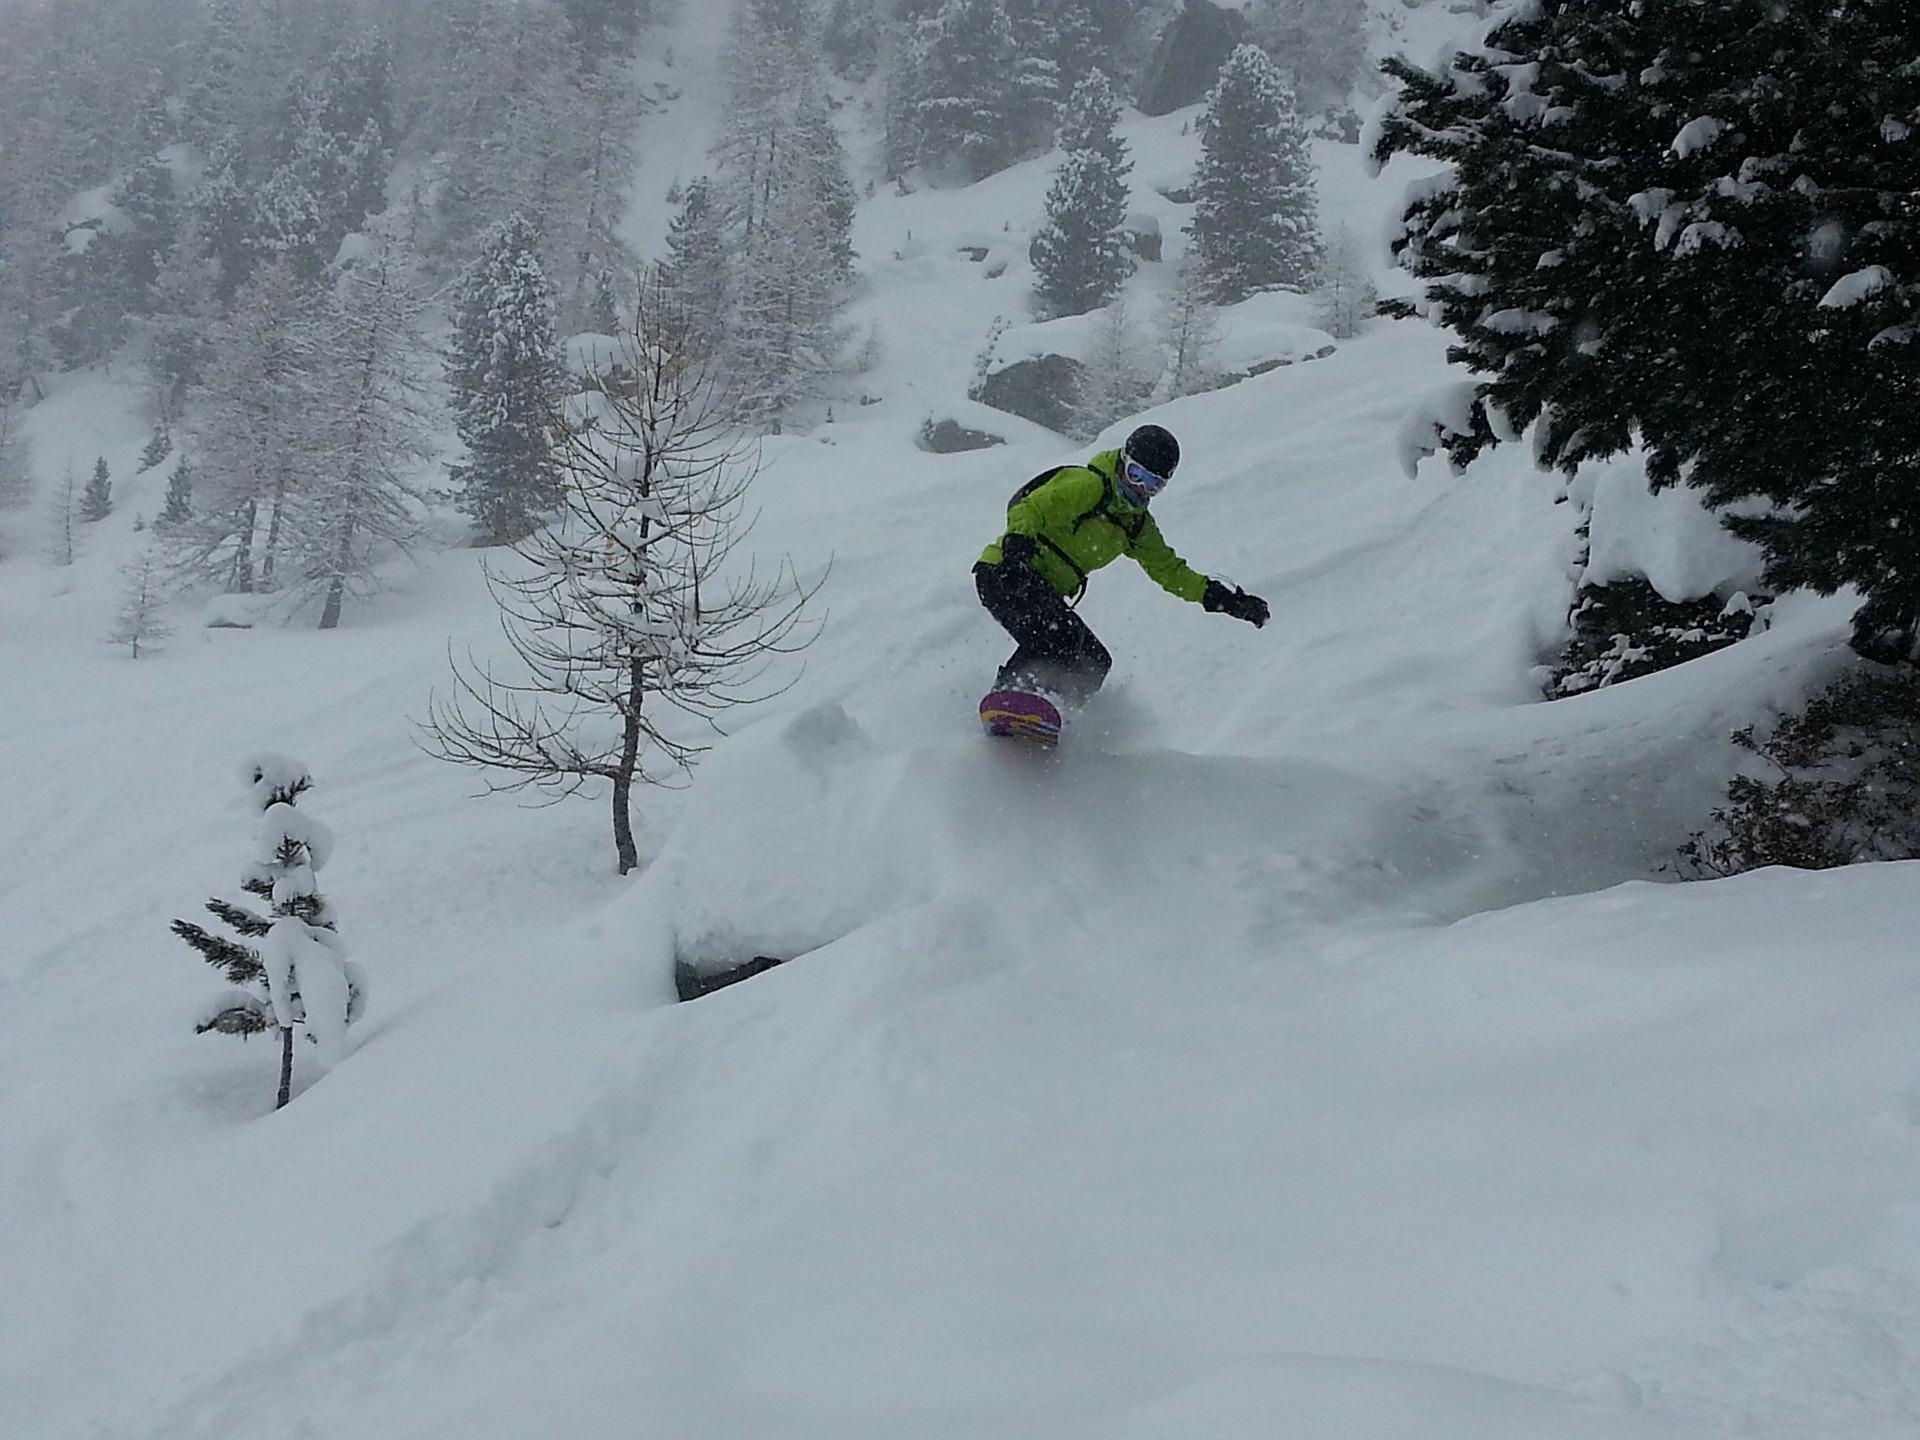 snowboard-through-trees